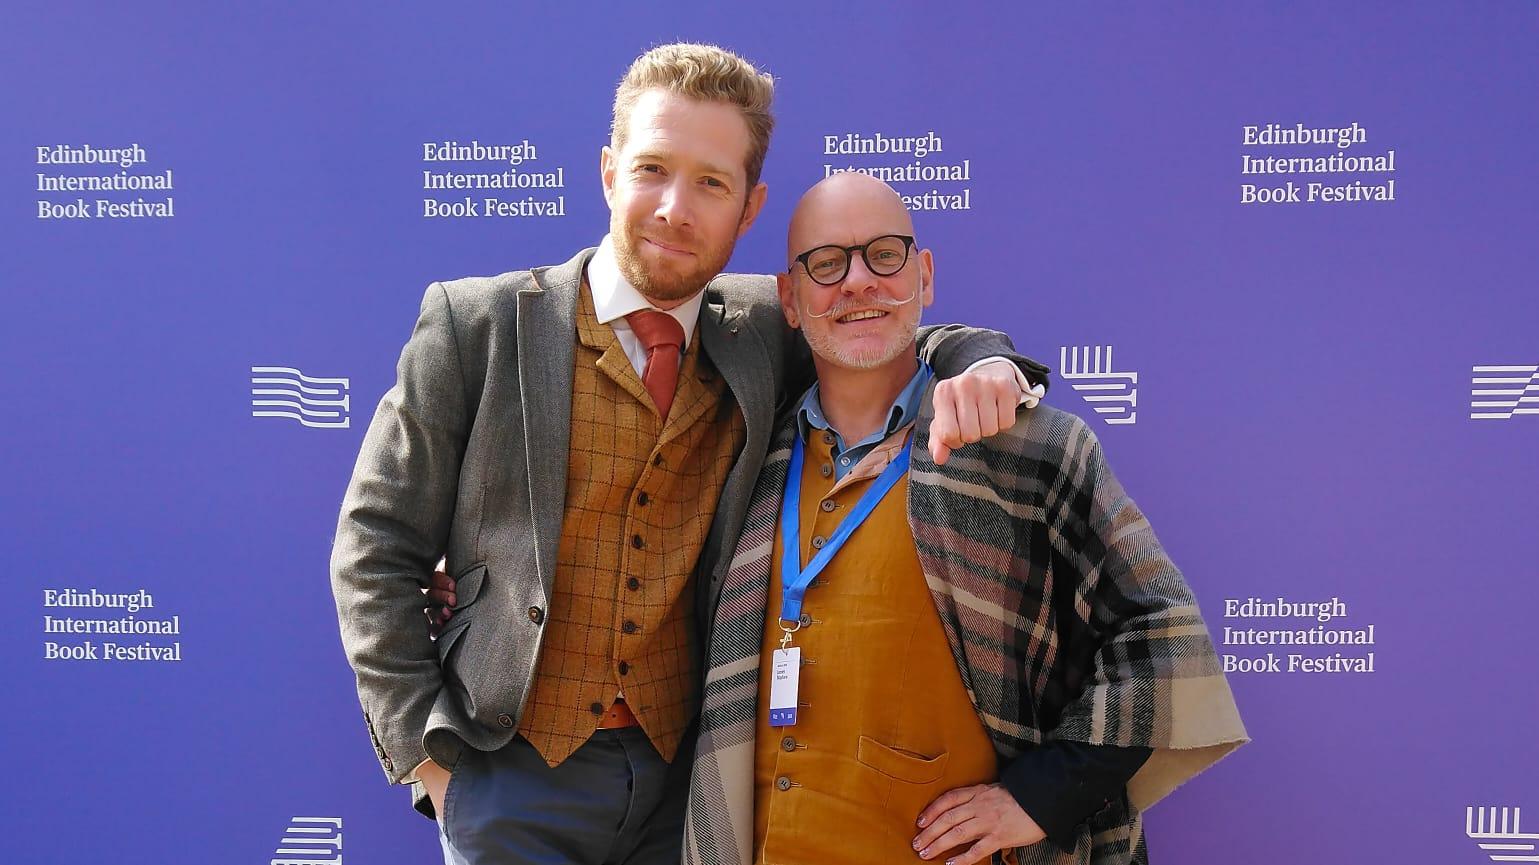 Zeb and James at Edinburgh, 2018